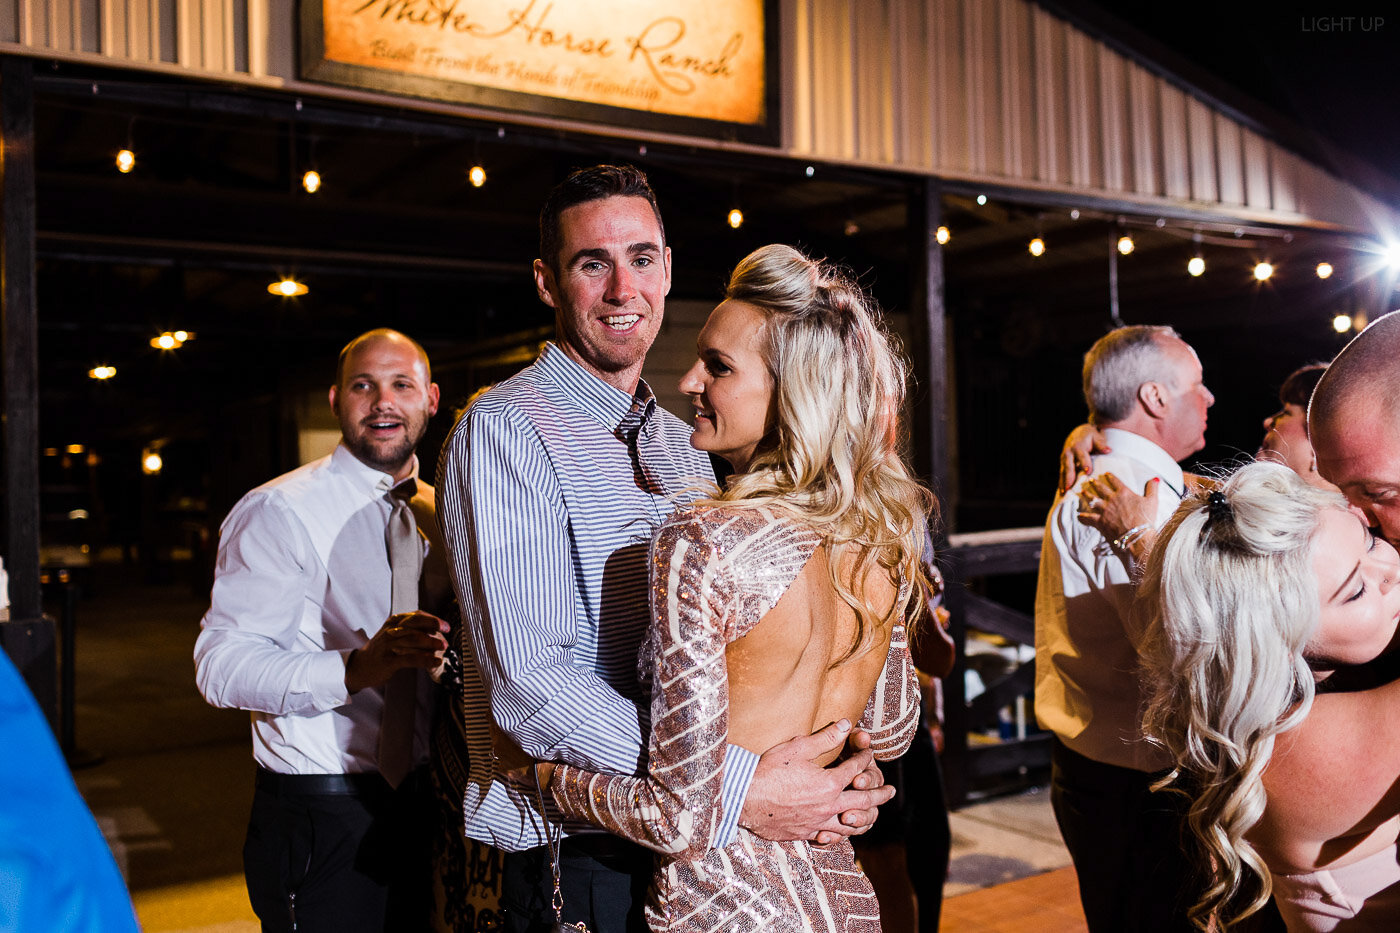 Lakeland-barn-wedding-at-white-horse-ranch-120.jpg